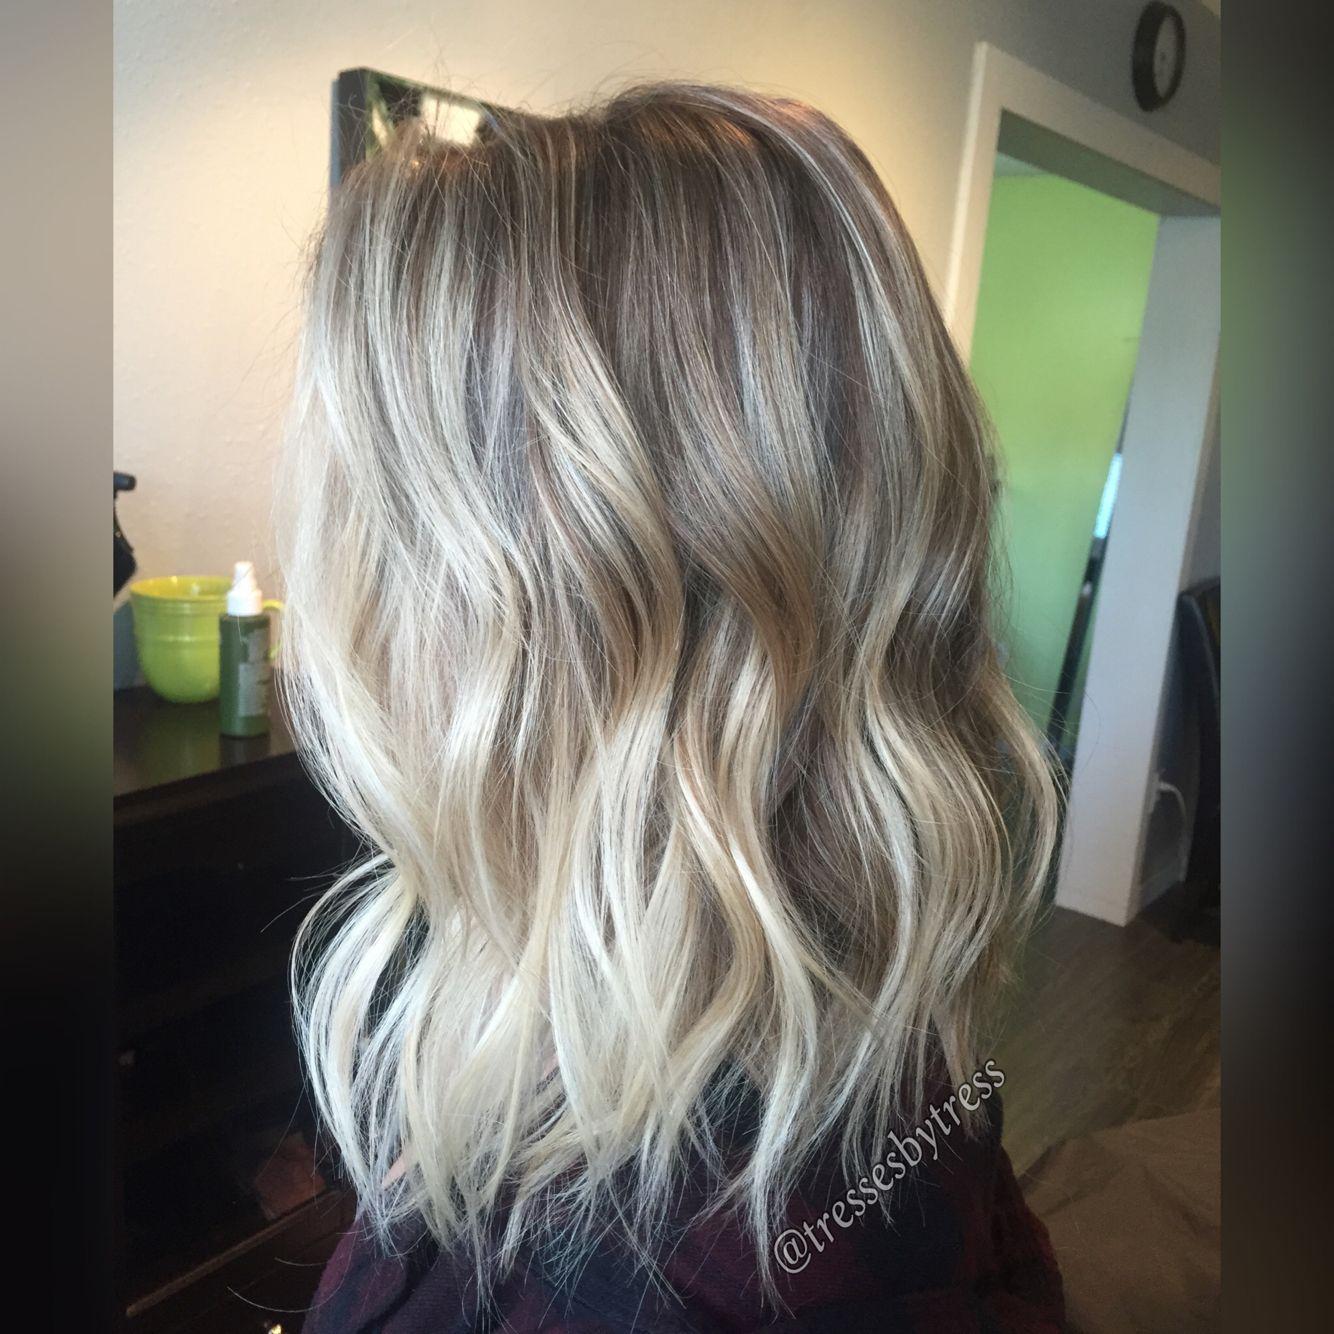 Blonde balayage textured lob #blondehair #blondebob # ...